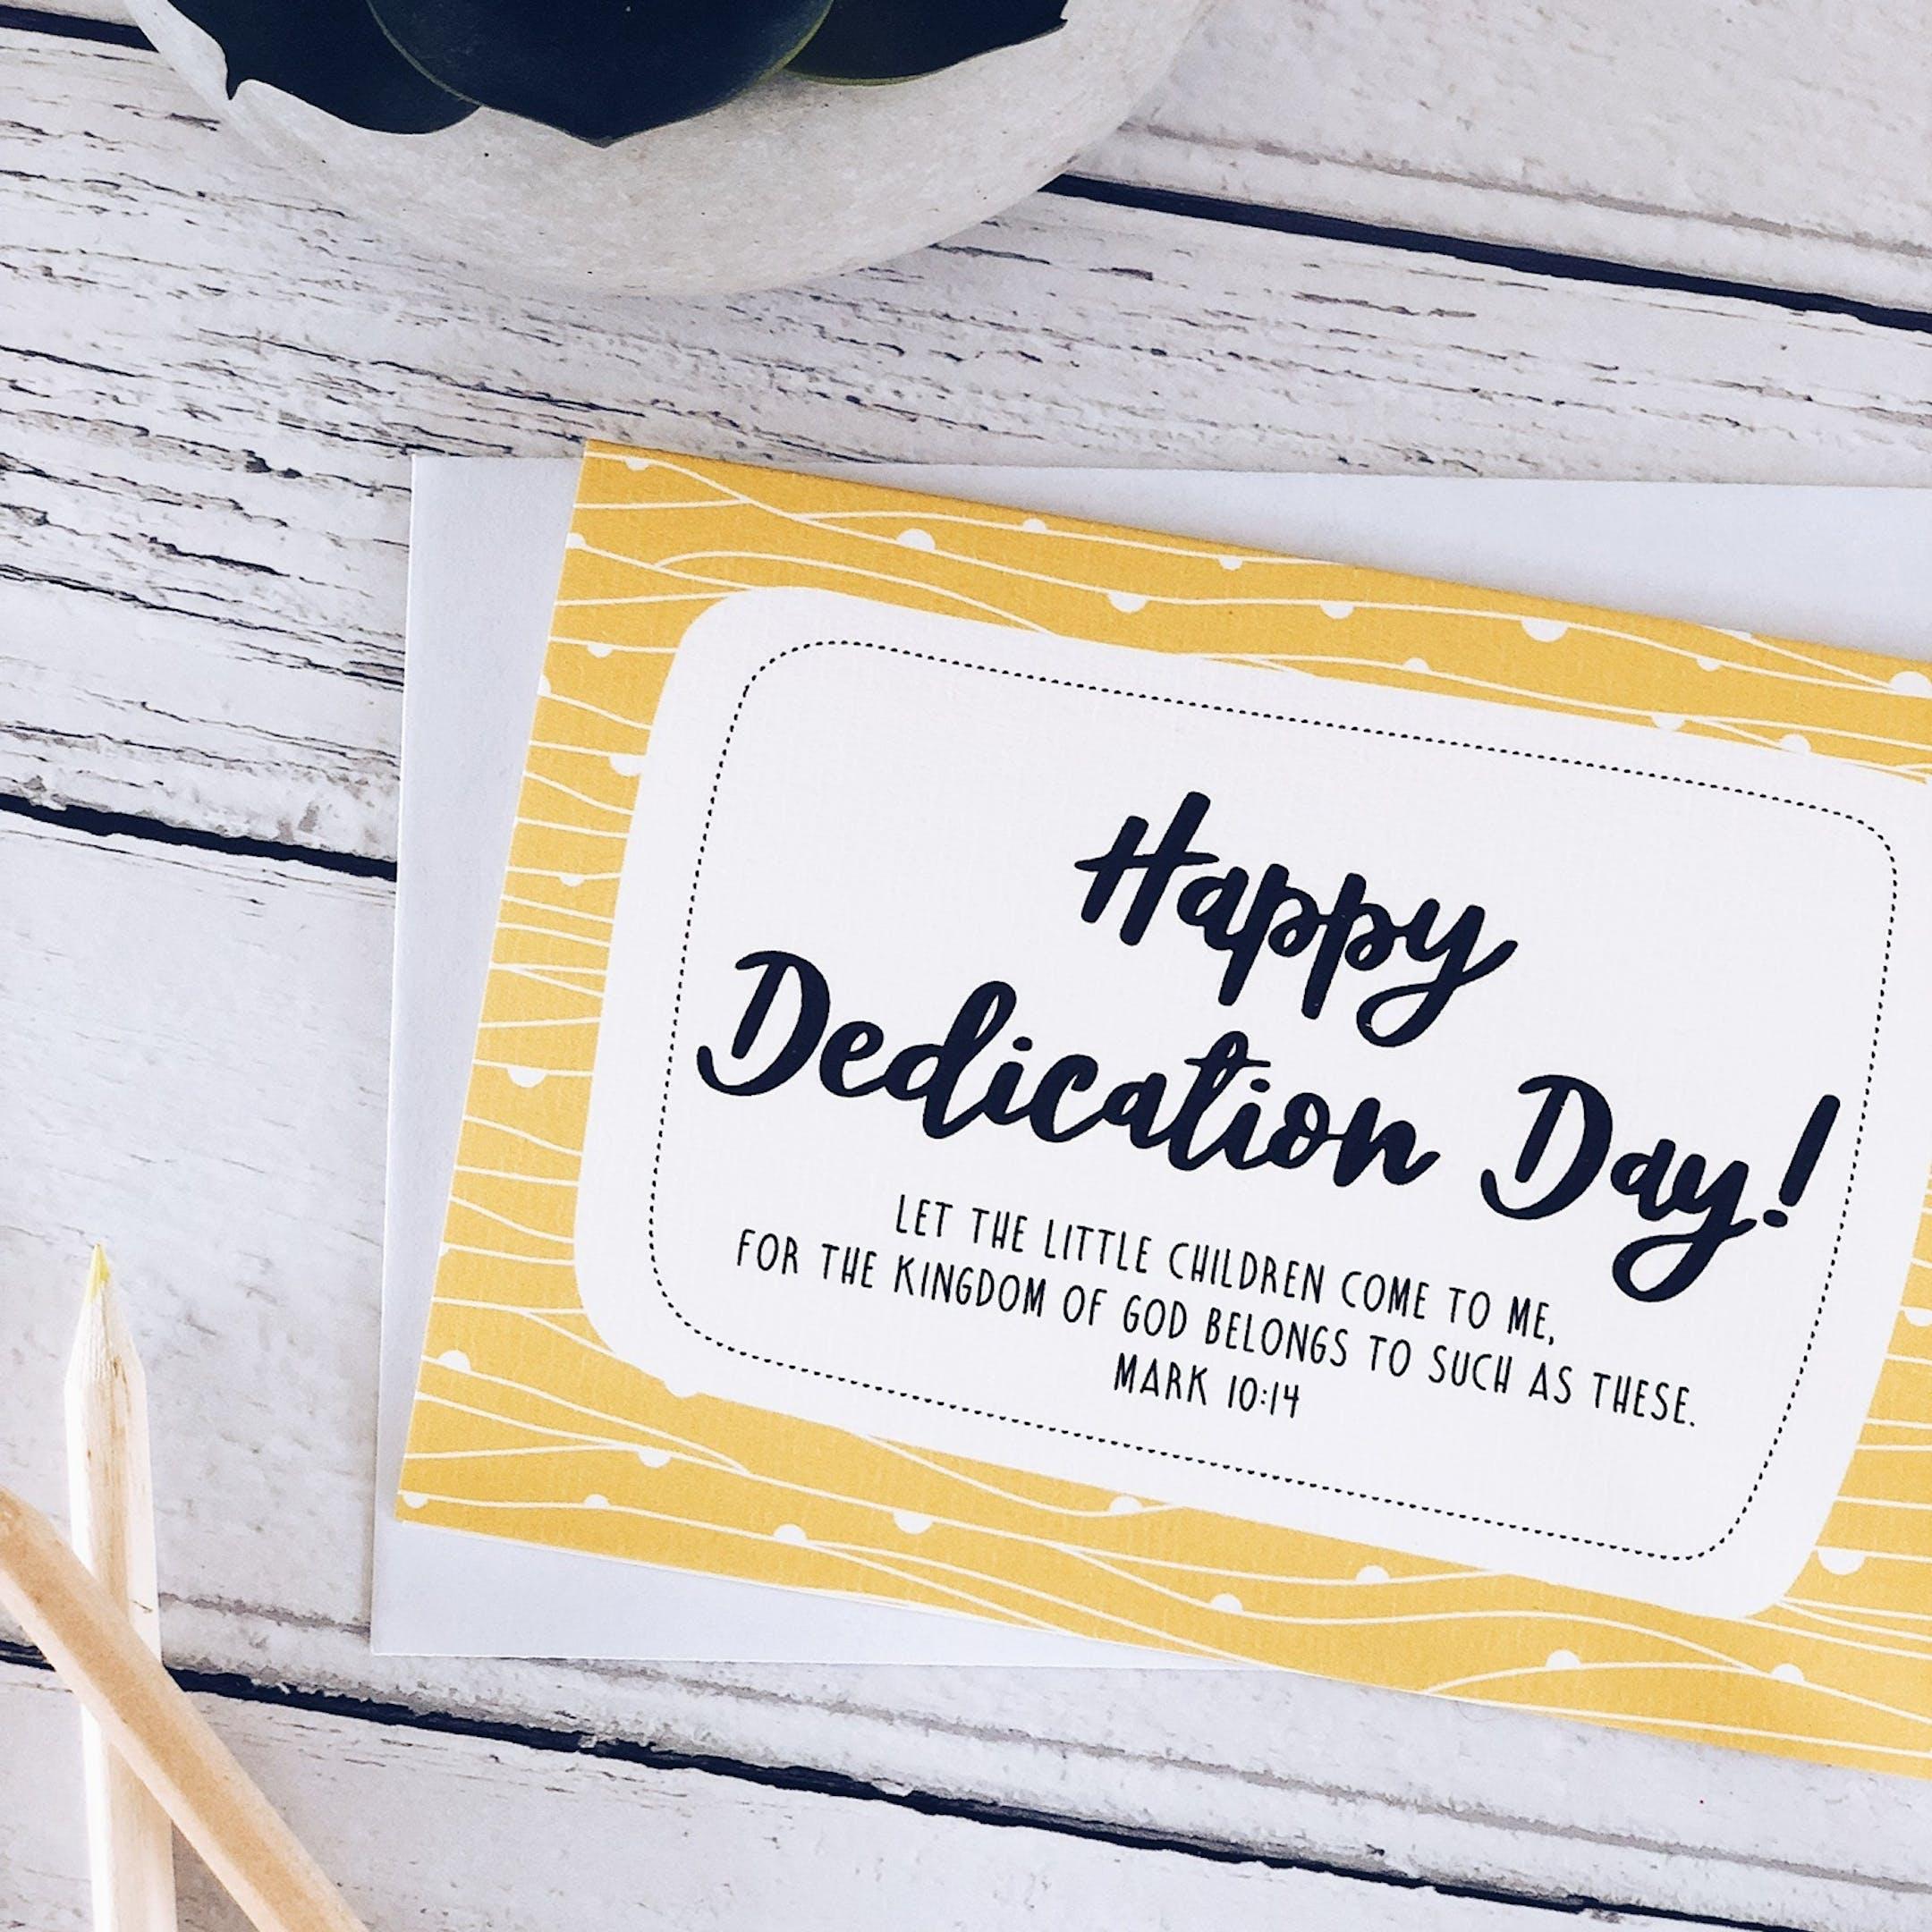 A6 Mark 10:14 Dedication Card - Izzy and Pop